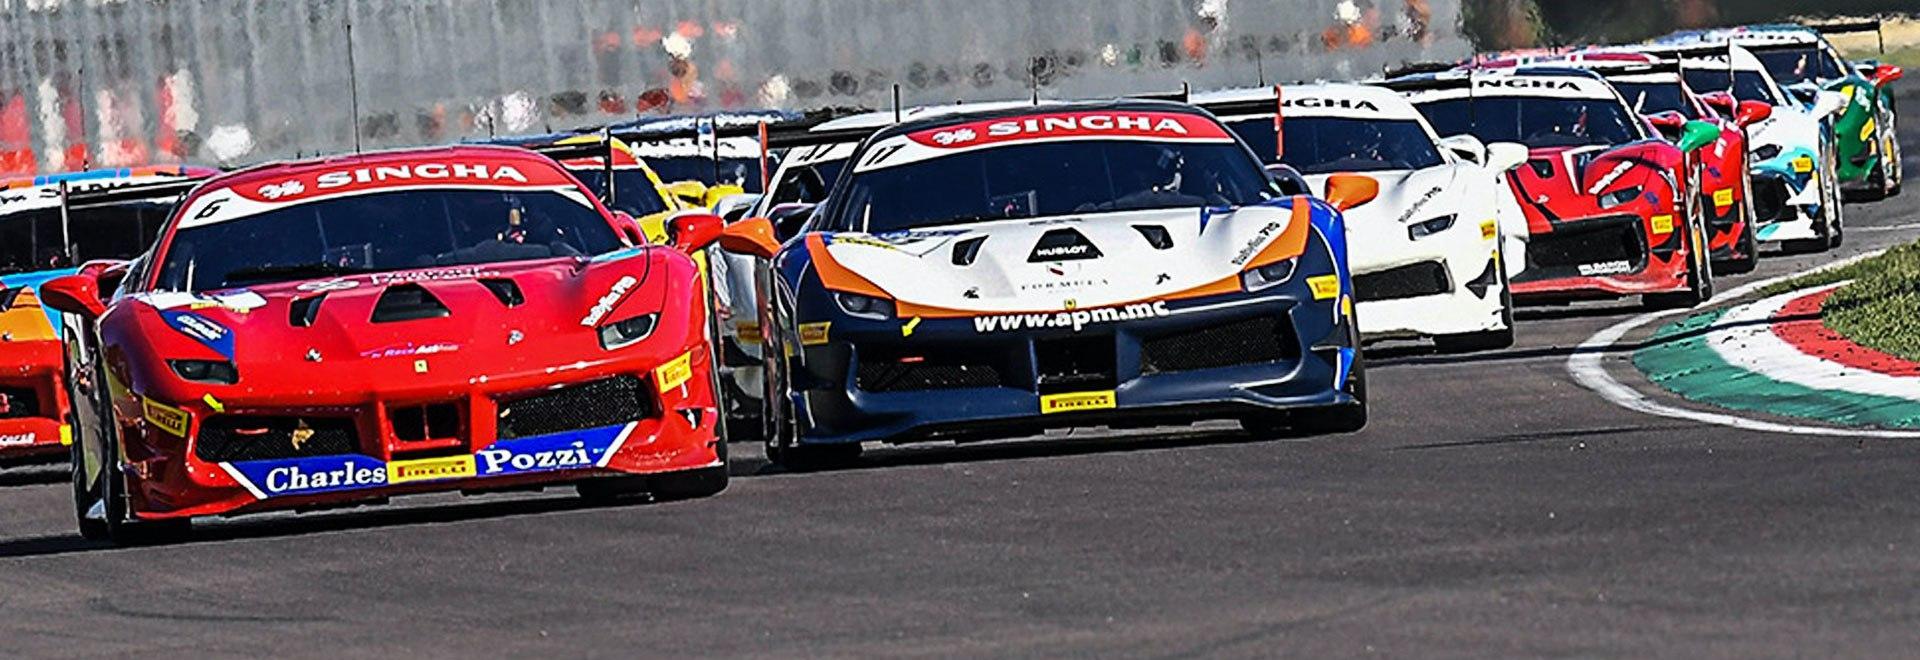 Trofeo Pirelli Barcellona. Gara 2